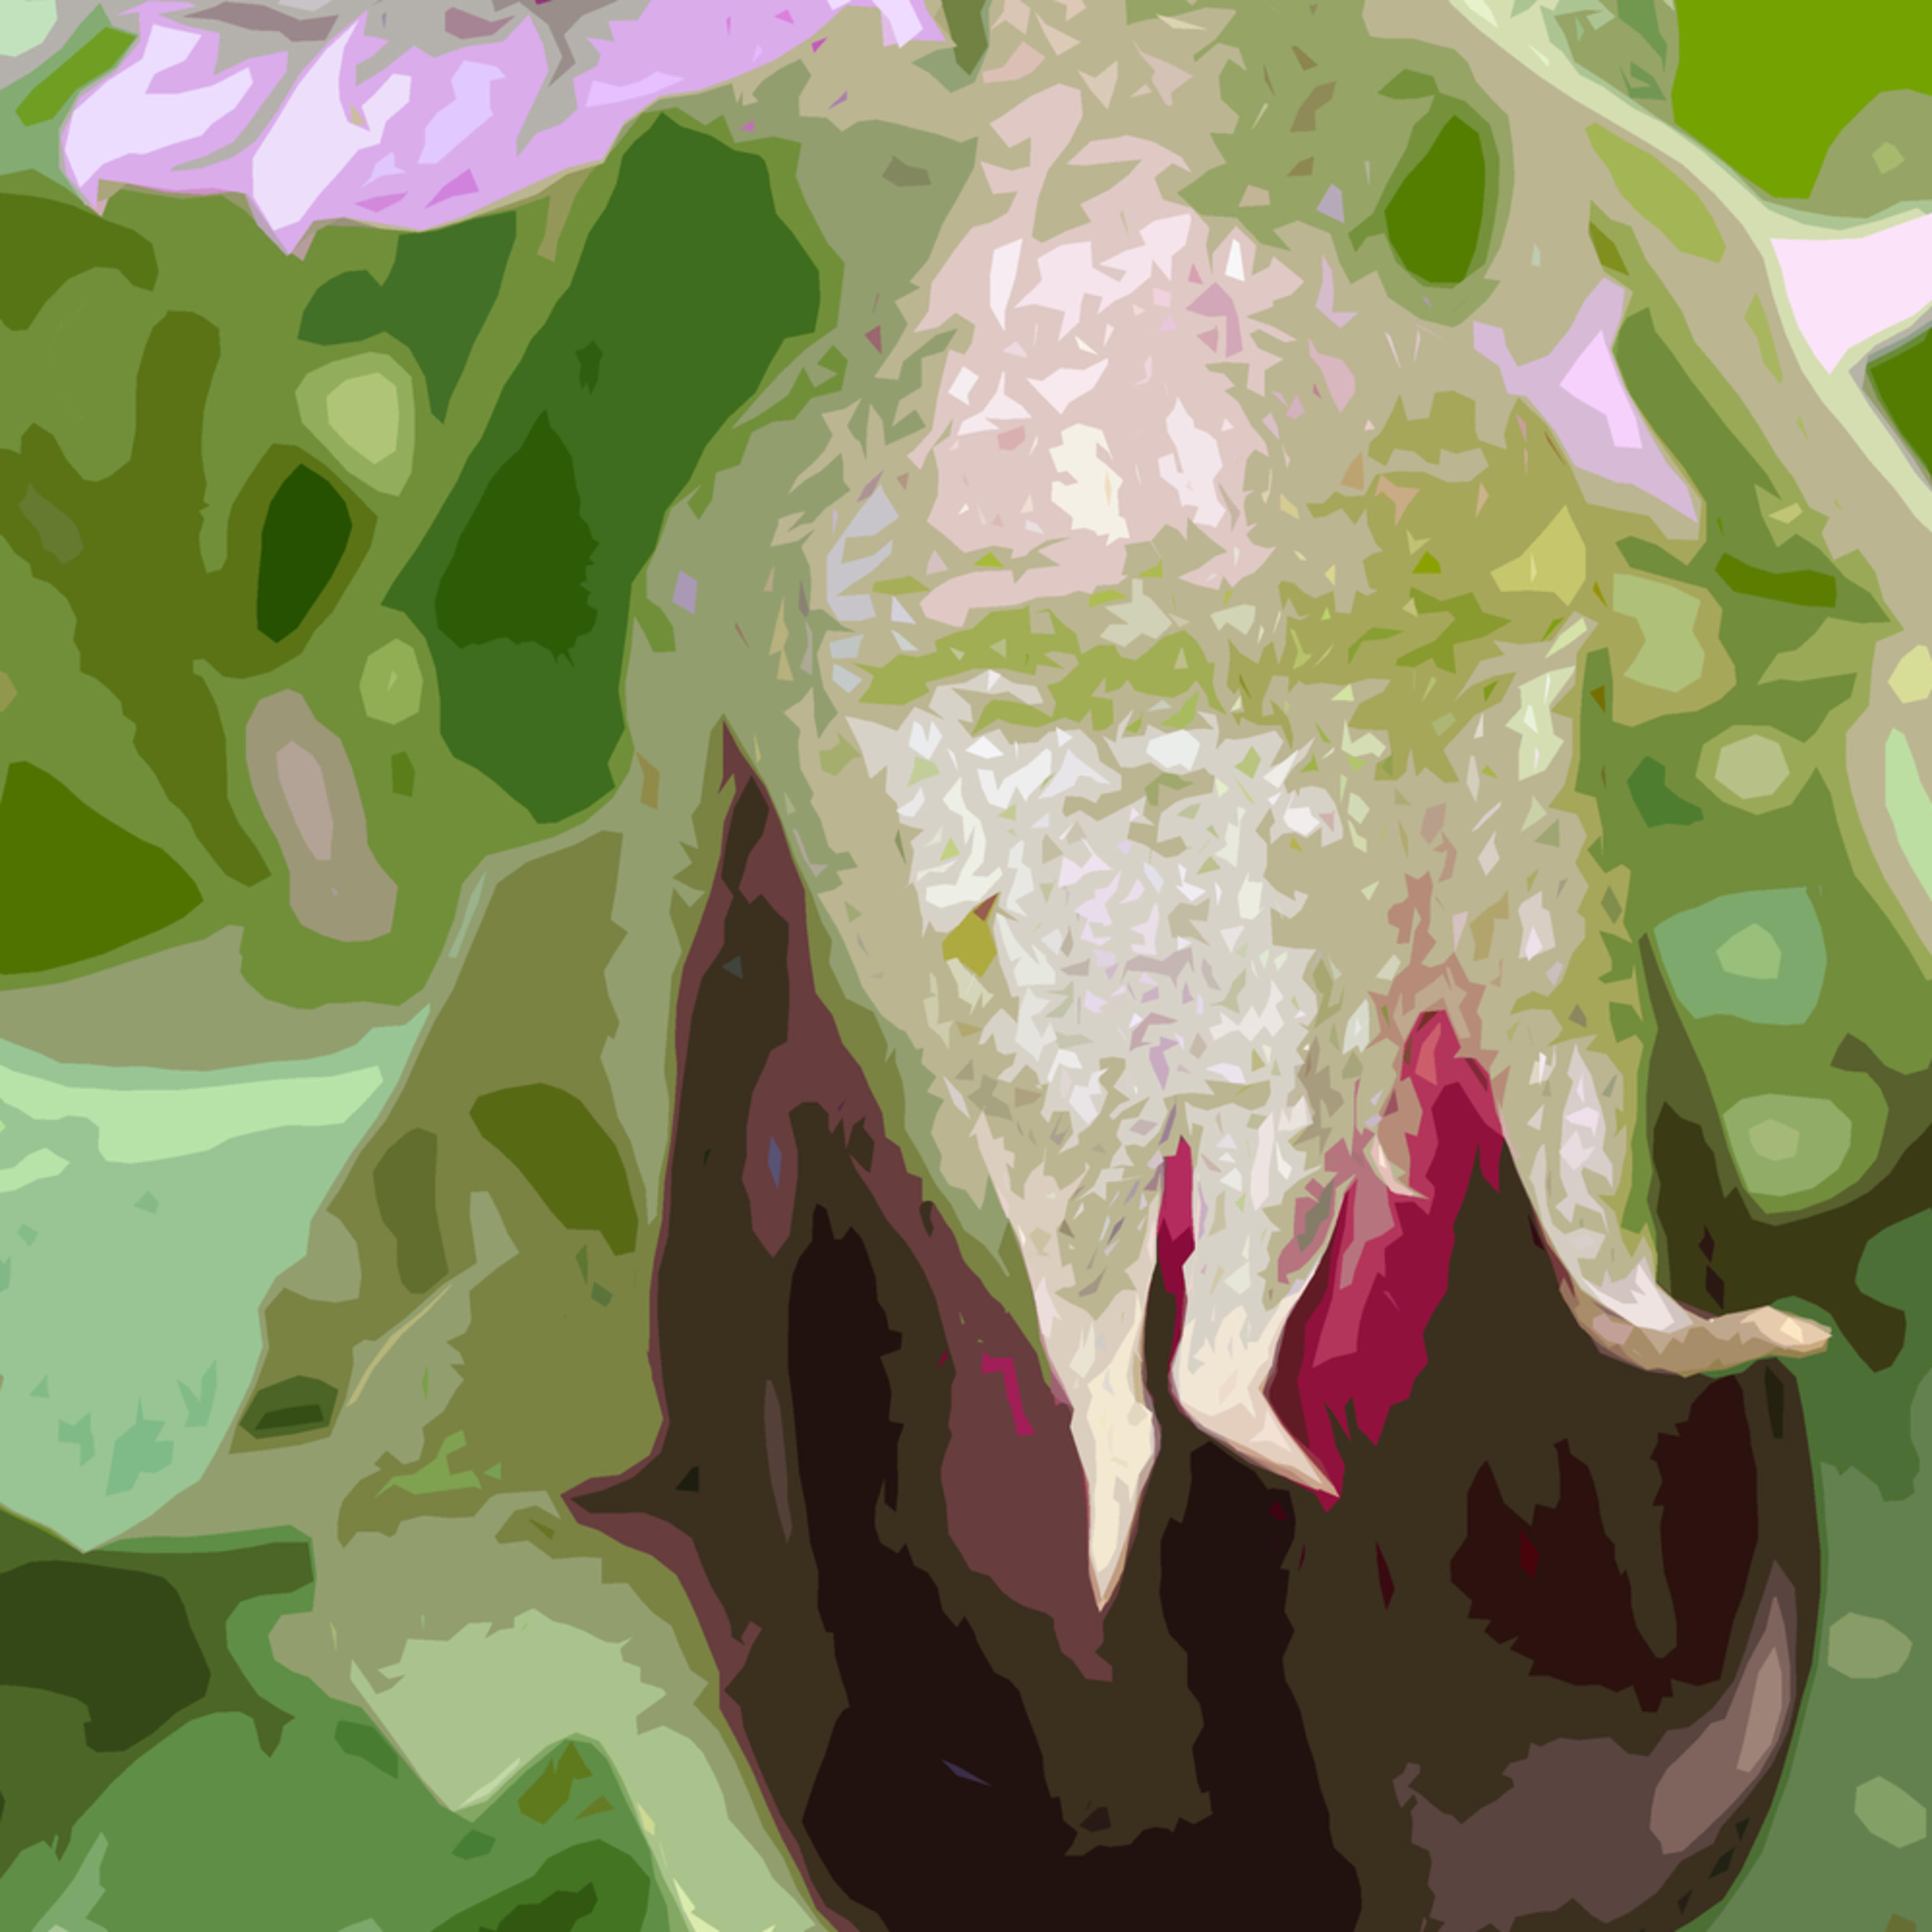 Eggplantblossom2.3 vuts5p